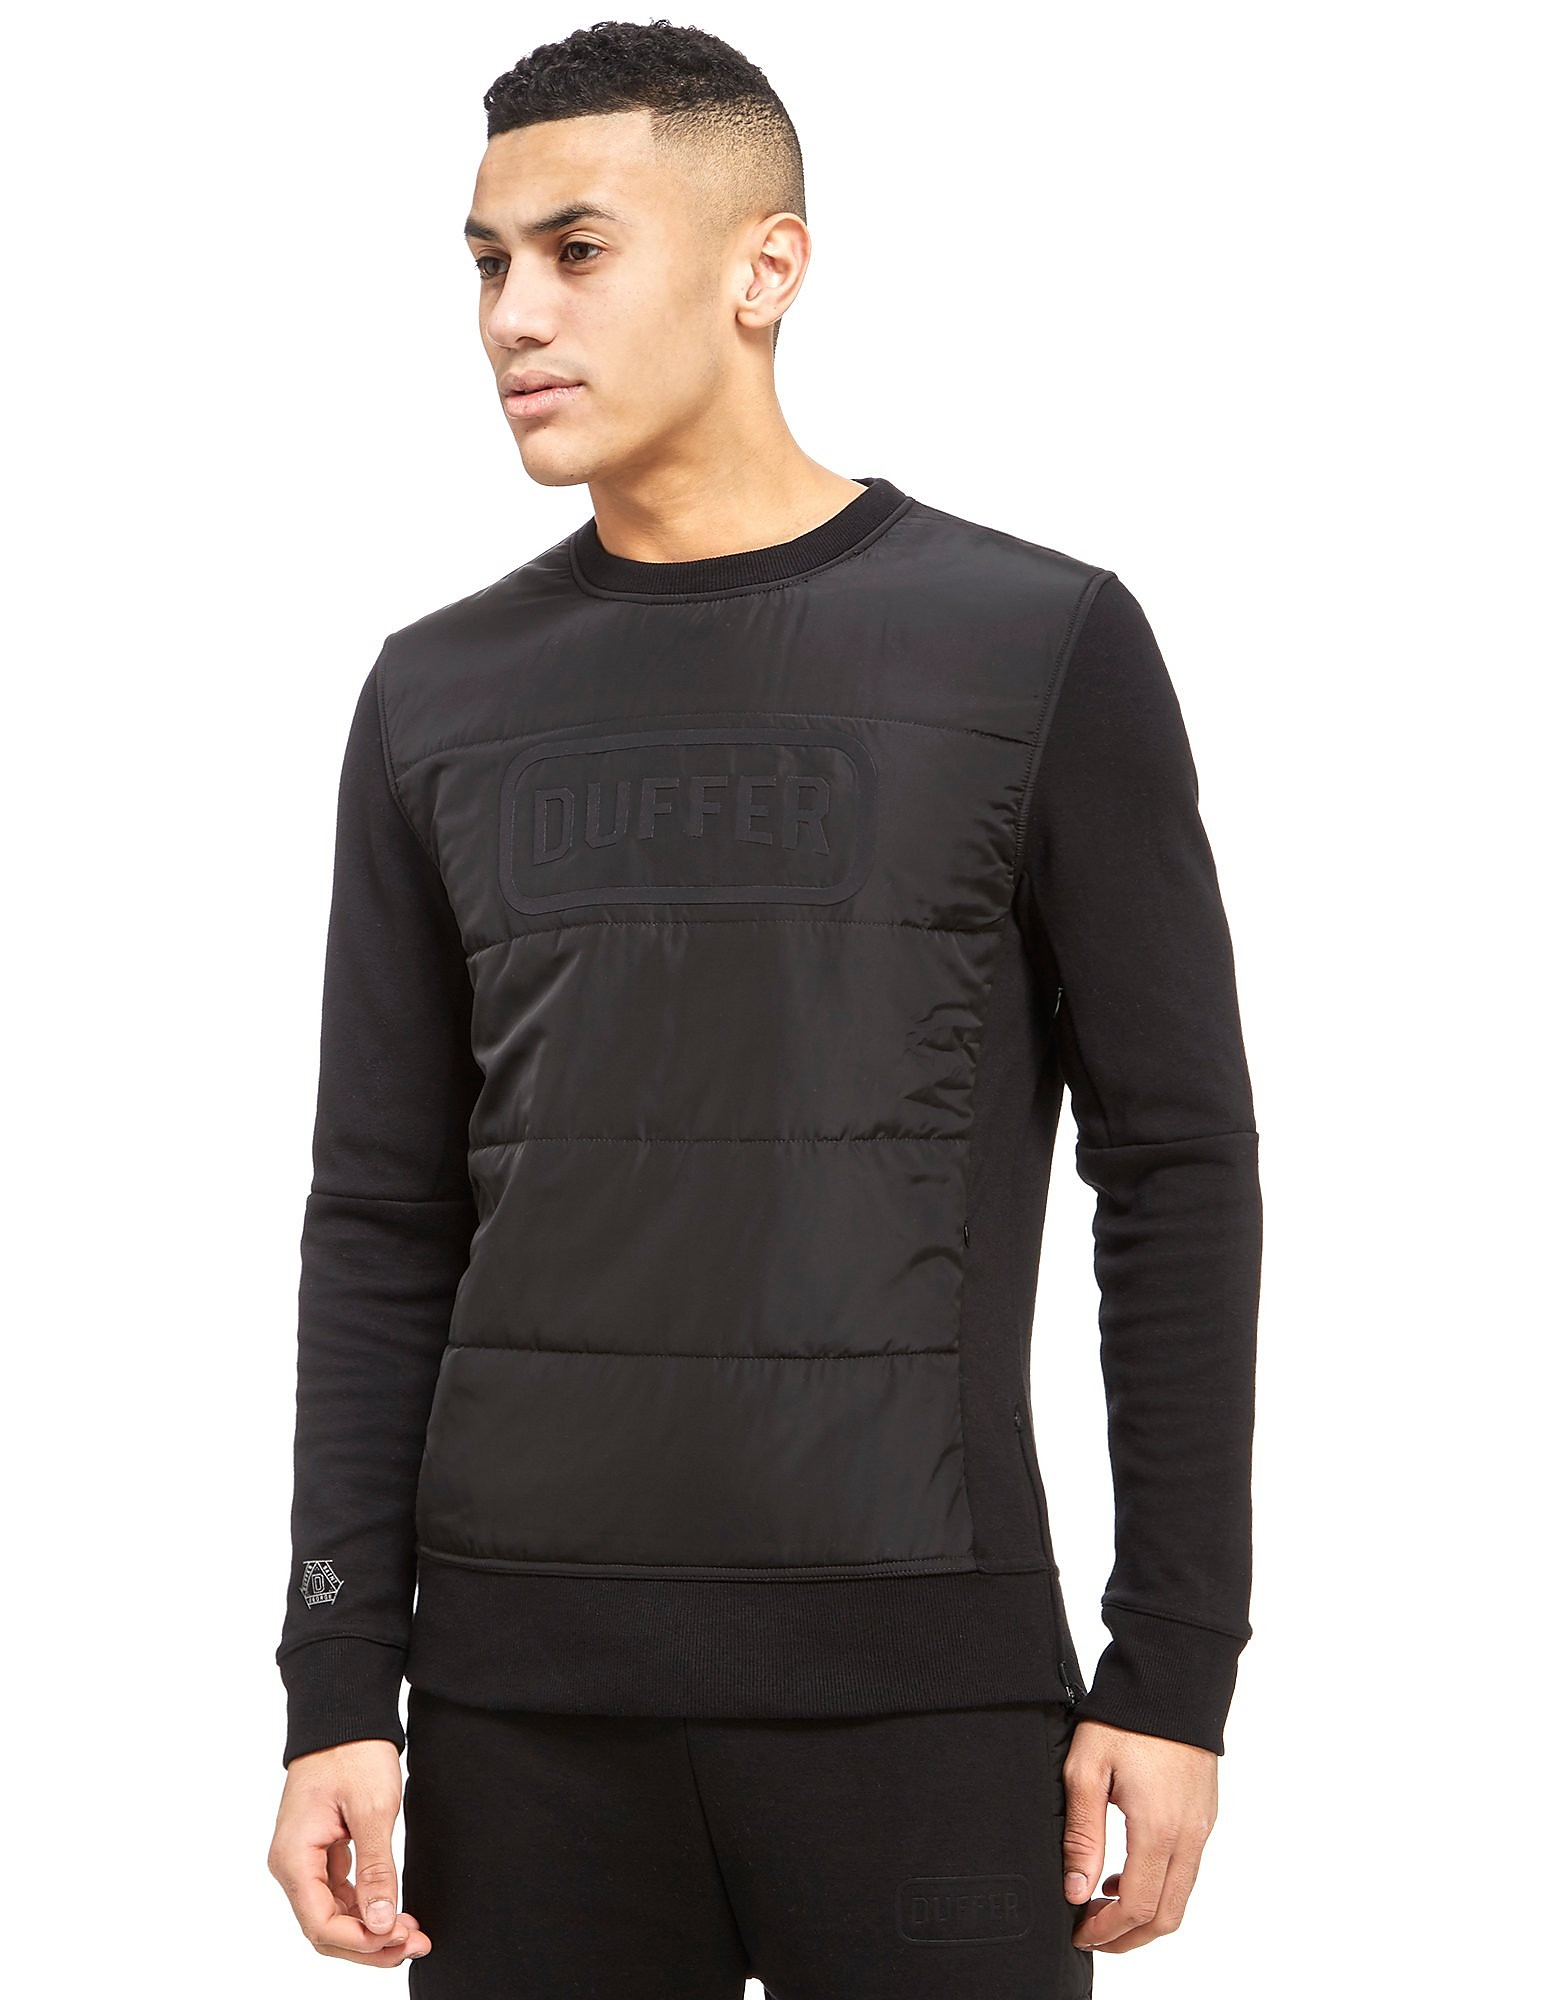 Duffer of St George Tenor Crew Sweatshirt